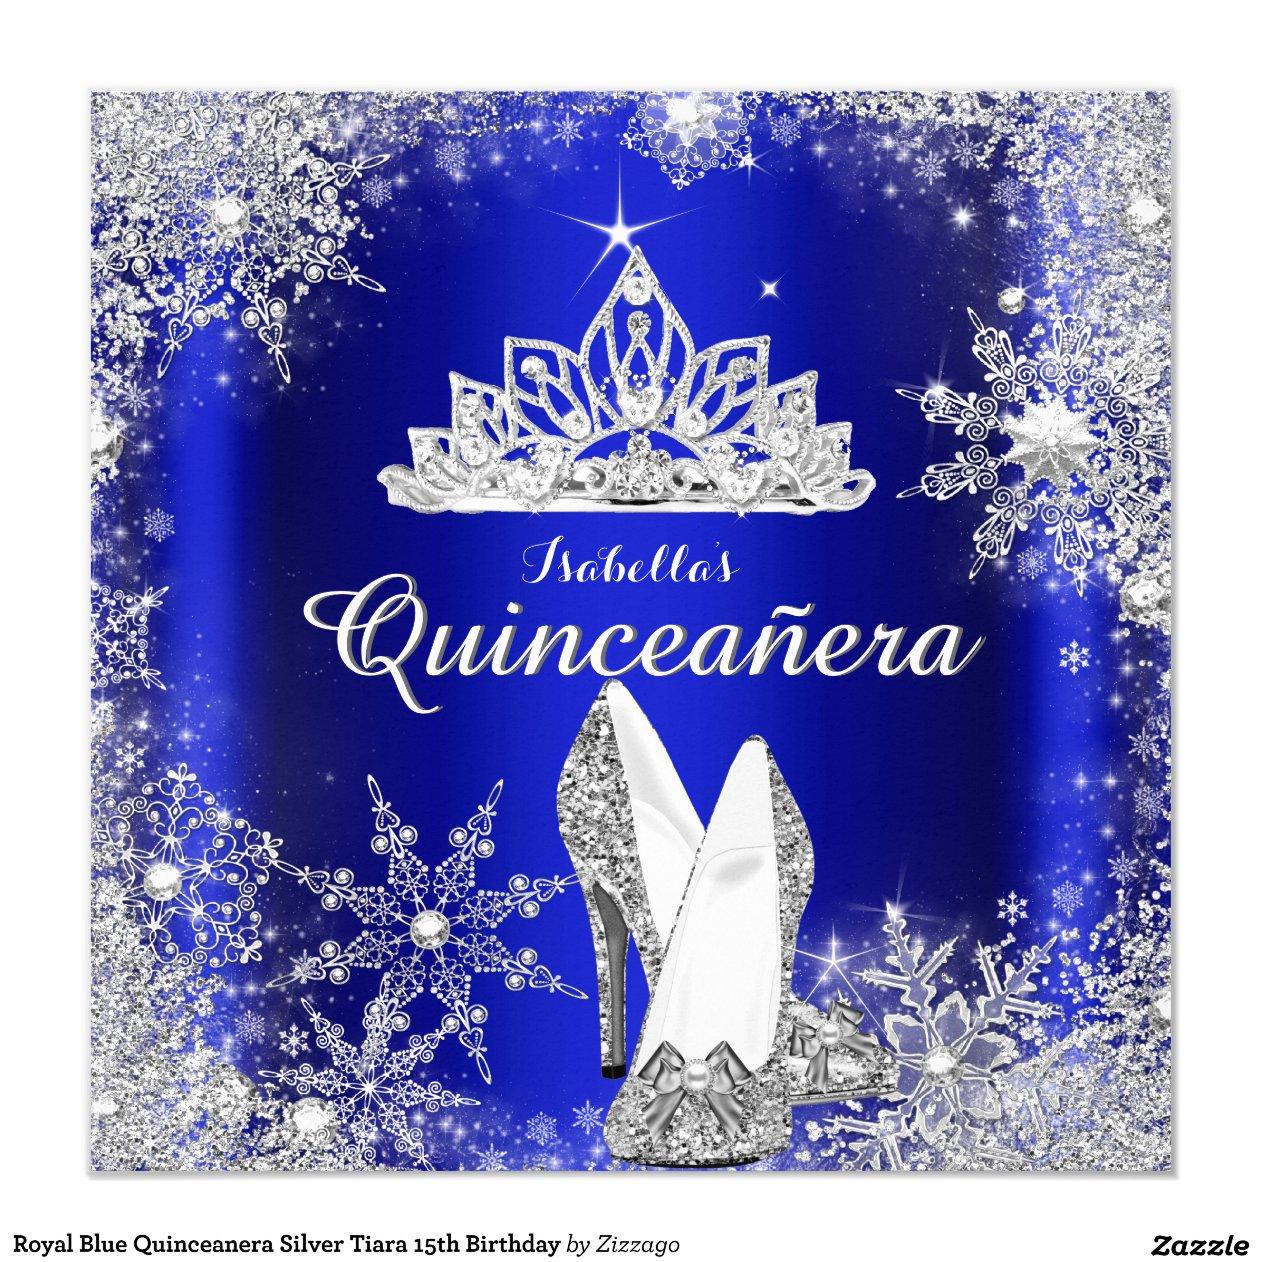 royal blue quinceanera silver tiara 15th birthday